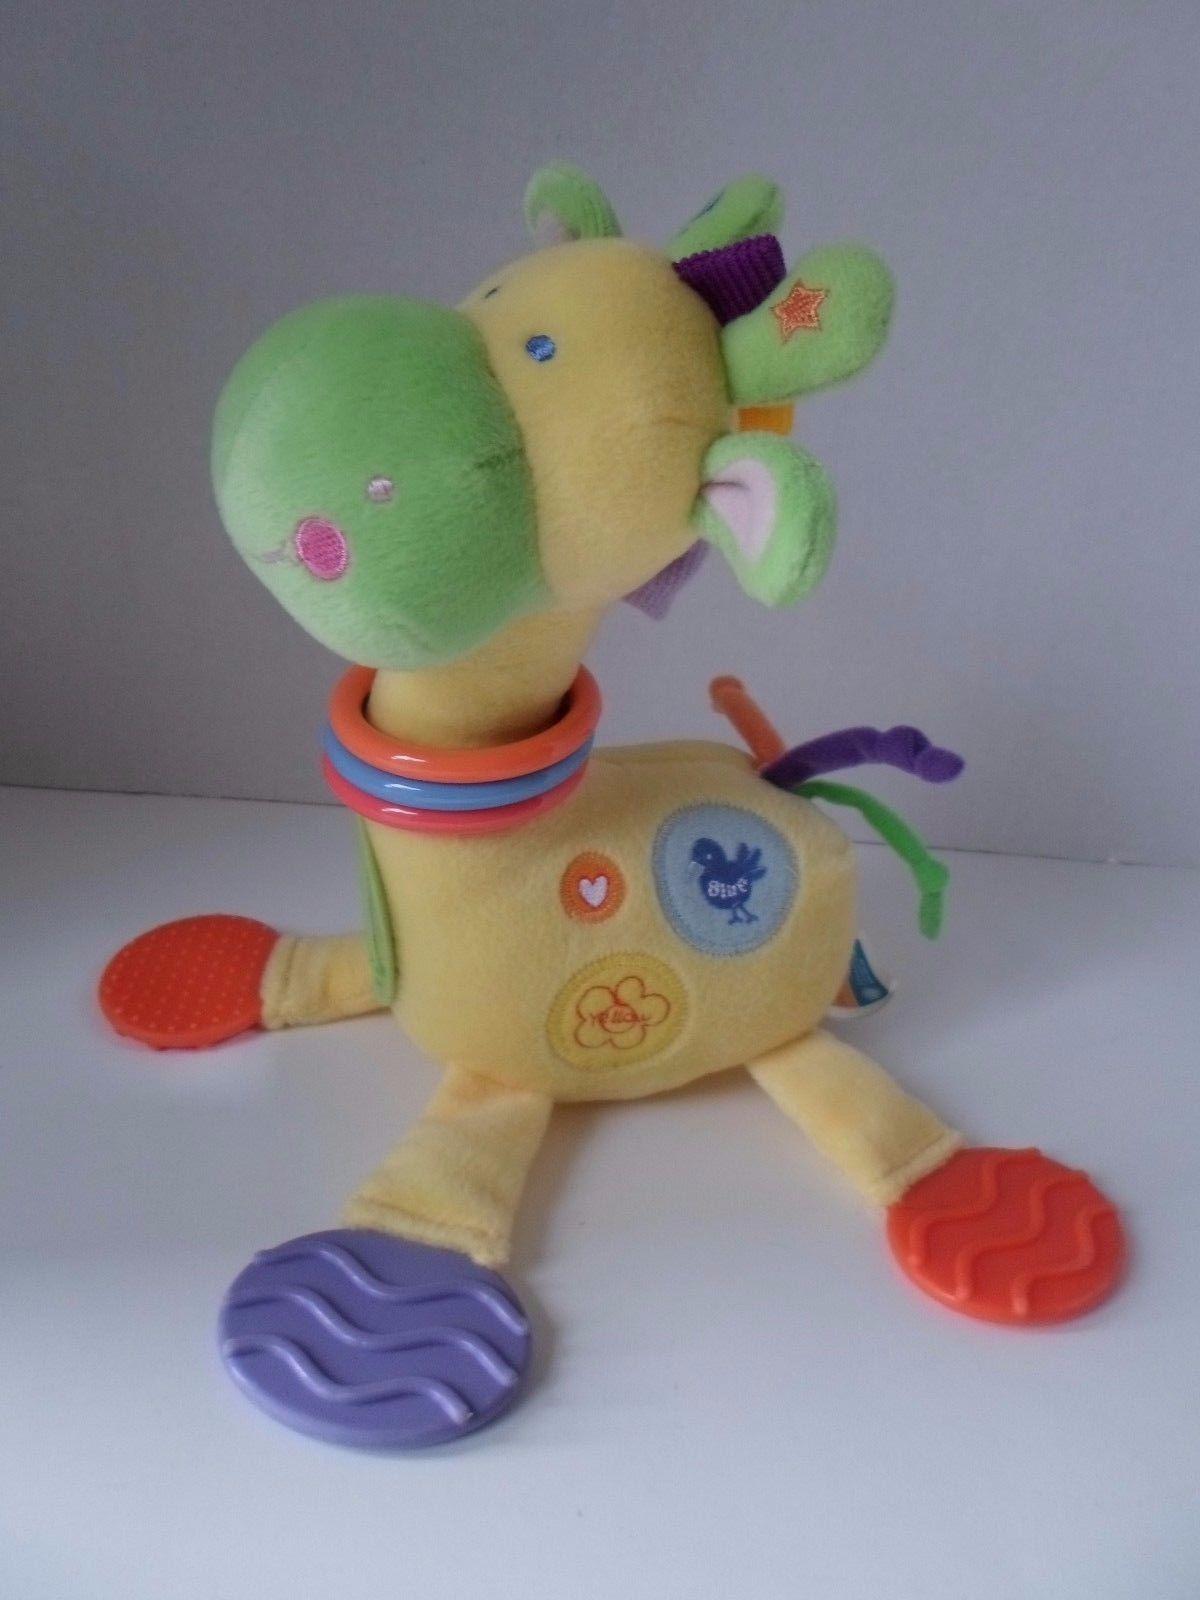 Kids Preferred Giraffe BABY Developmental Plush TOY Rattle Teether Mirror